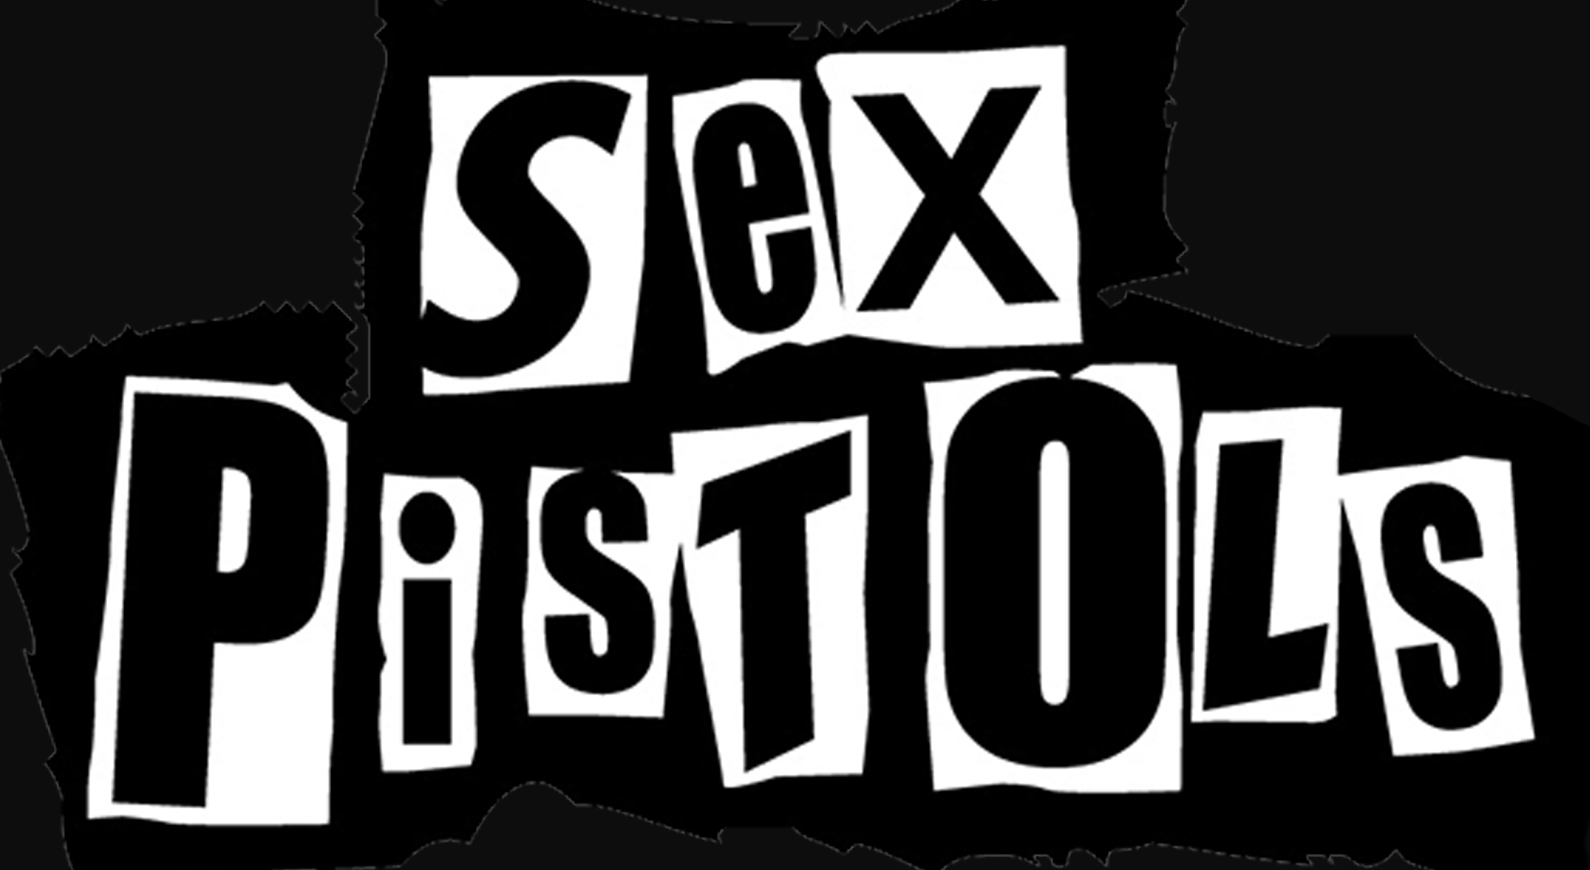 Take a girls virginity lyrics